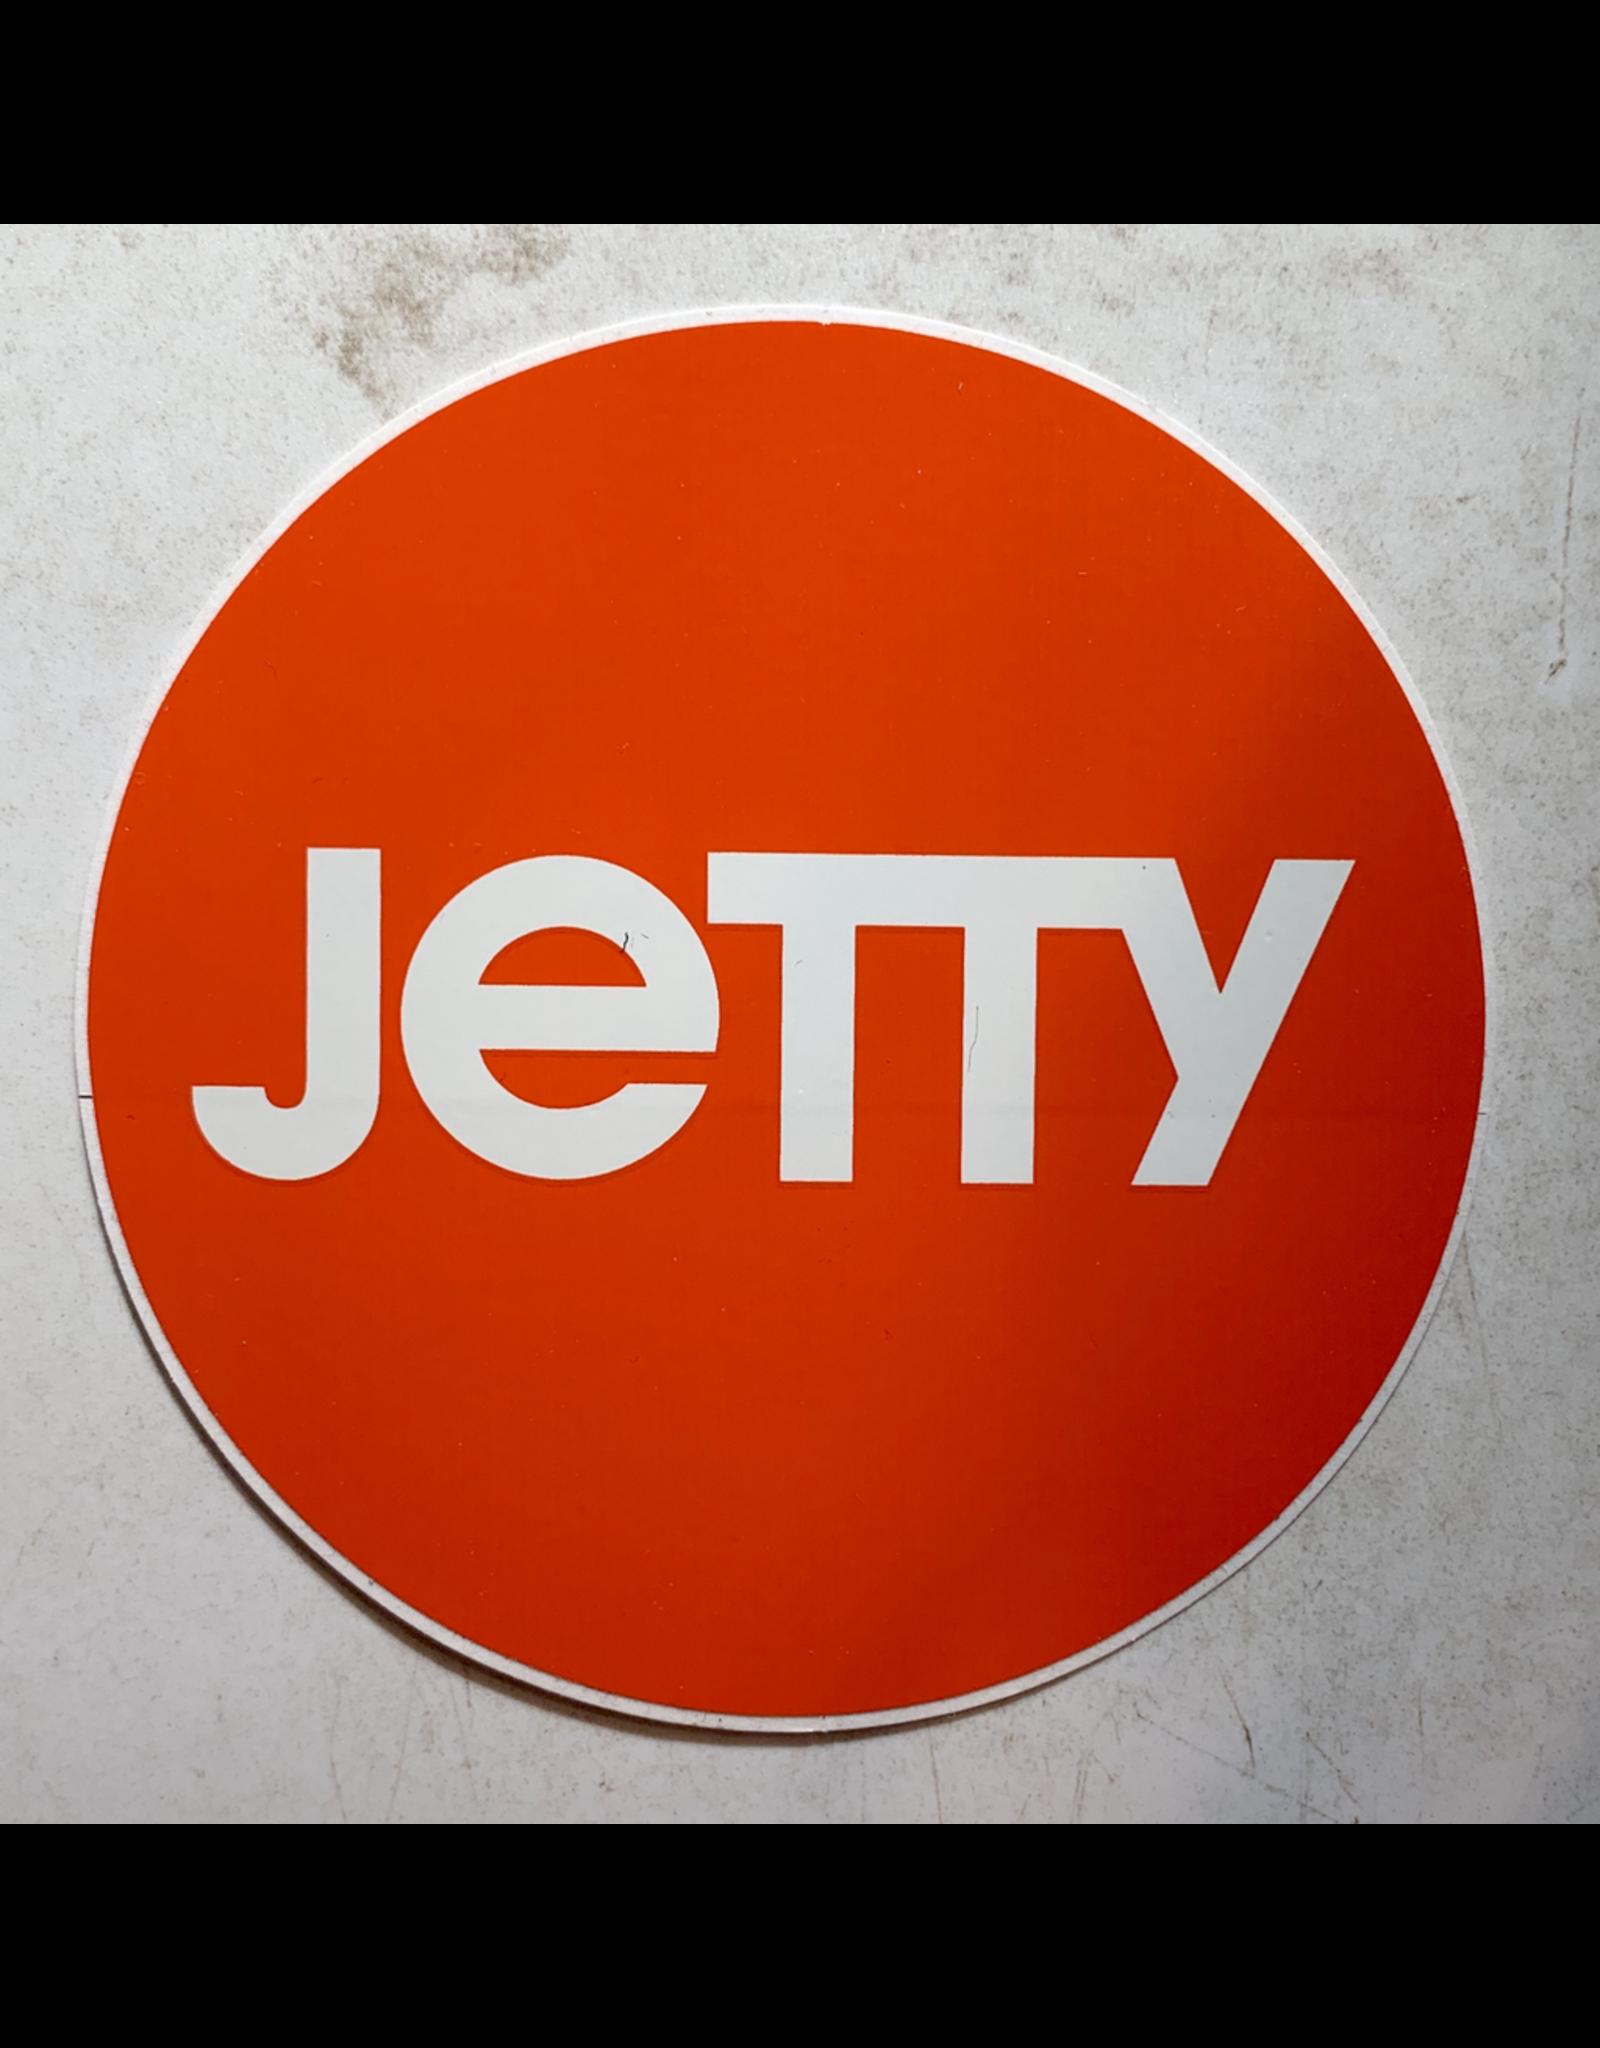 JETTY CIRCLE STICKER (ORANGE)